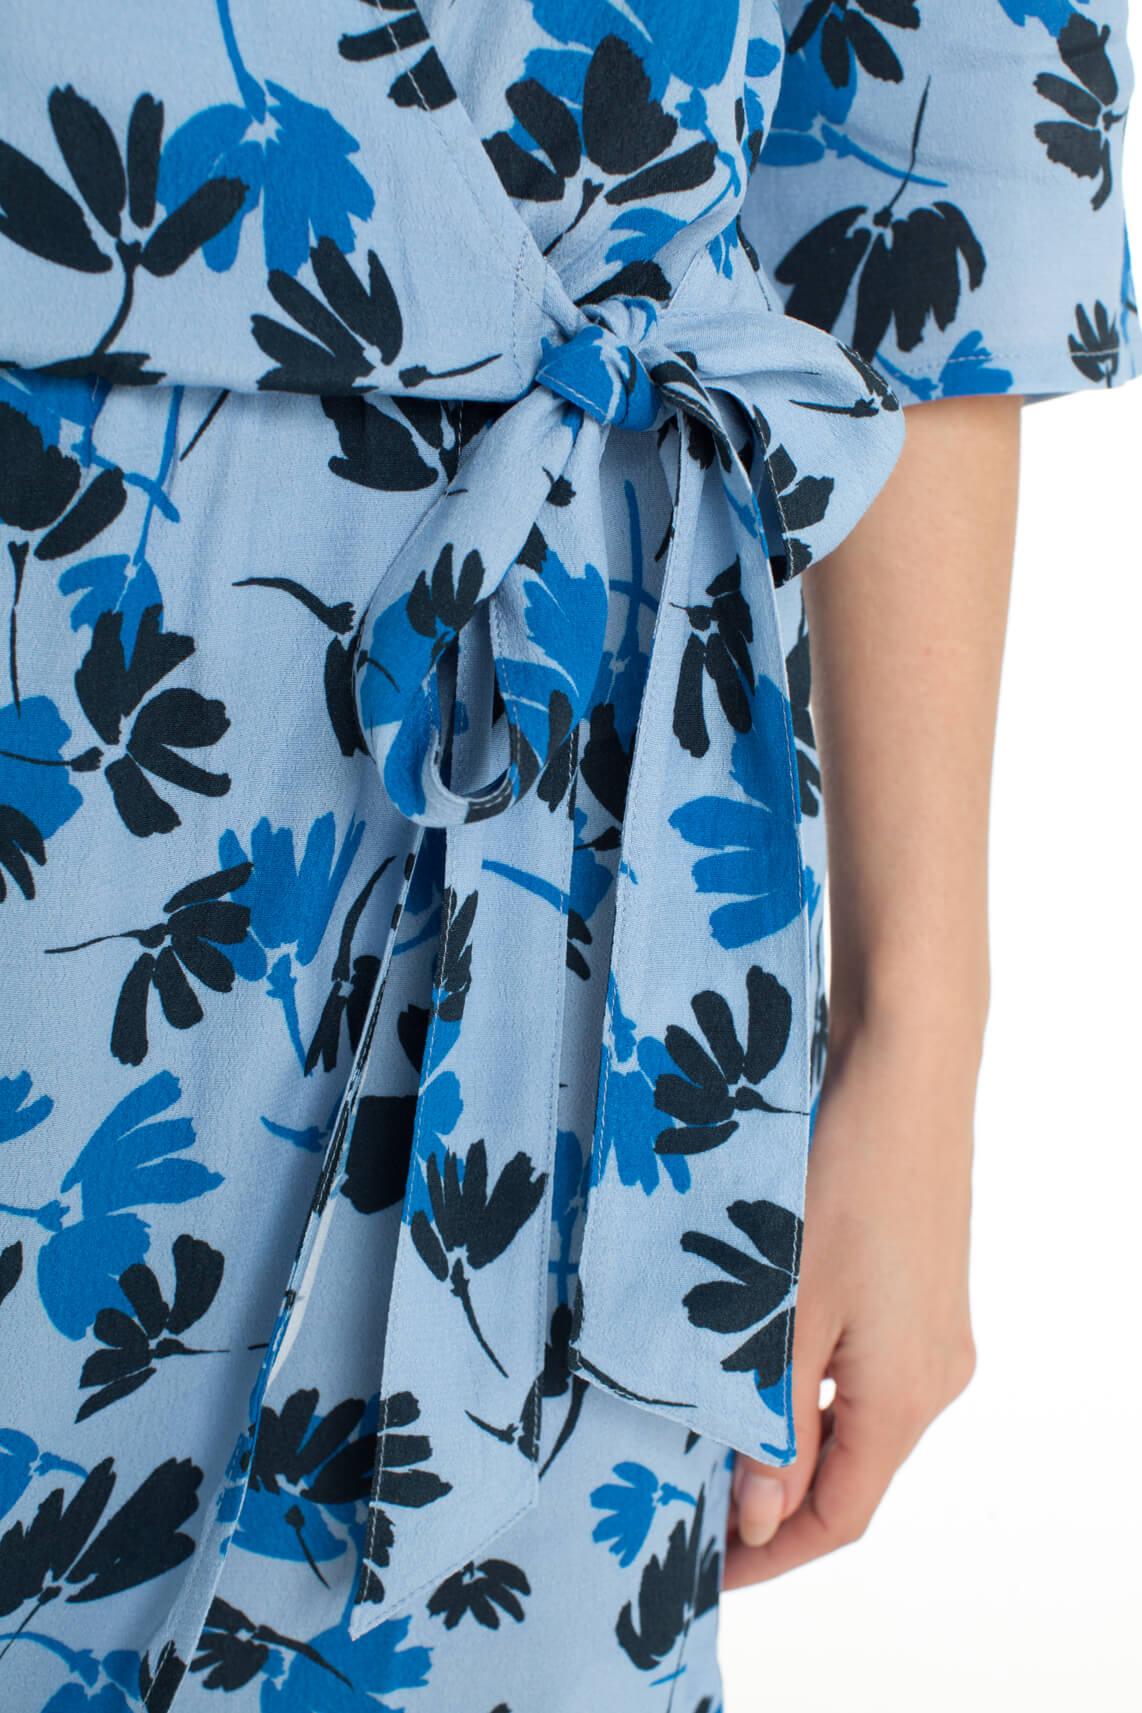 Anna Blue Dames Jumpsuit met bloemenprint Blauw